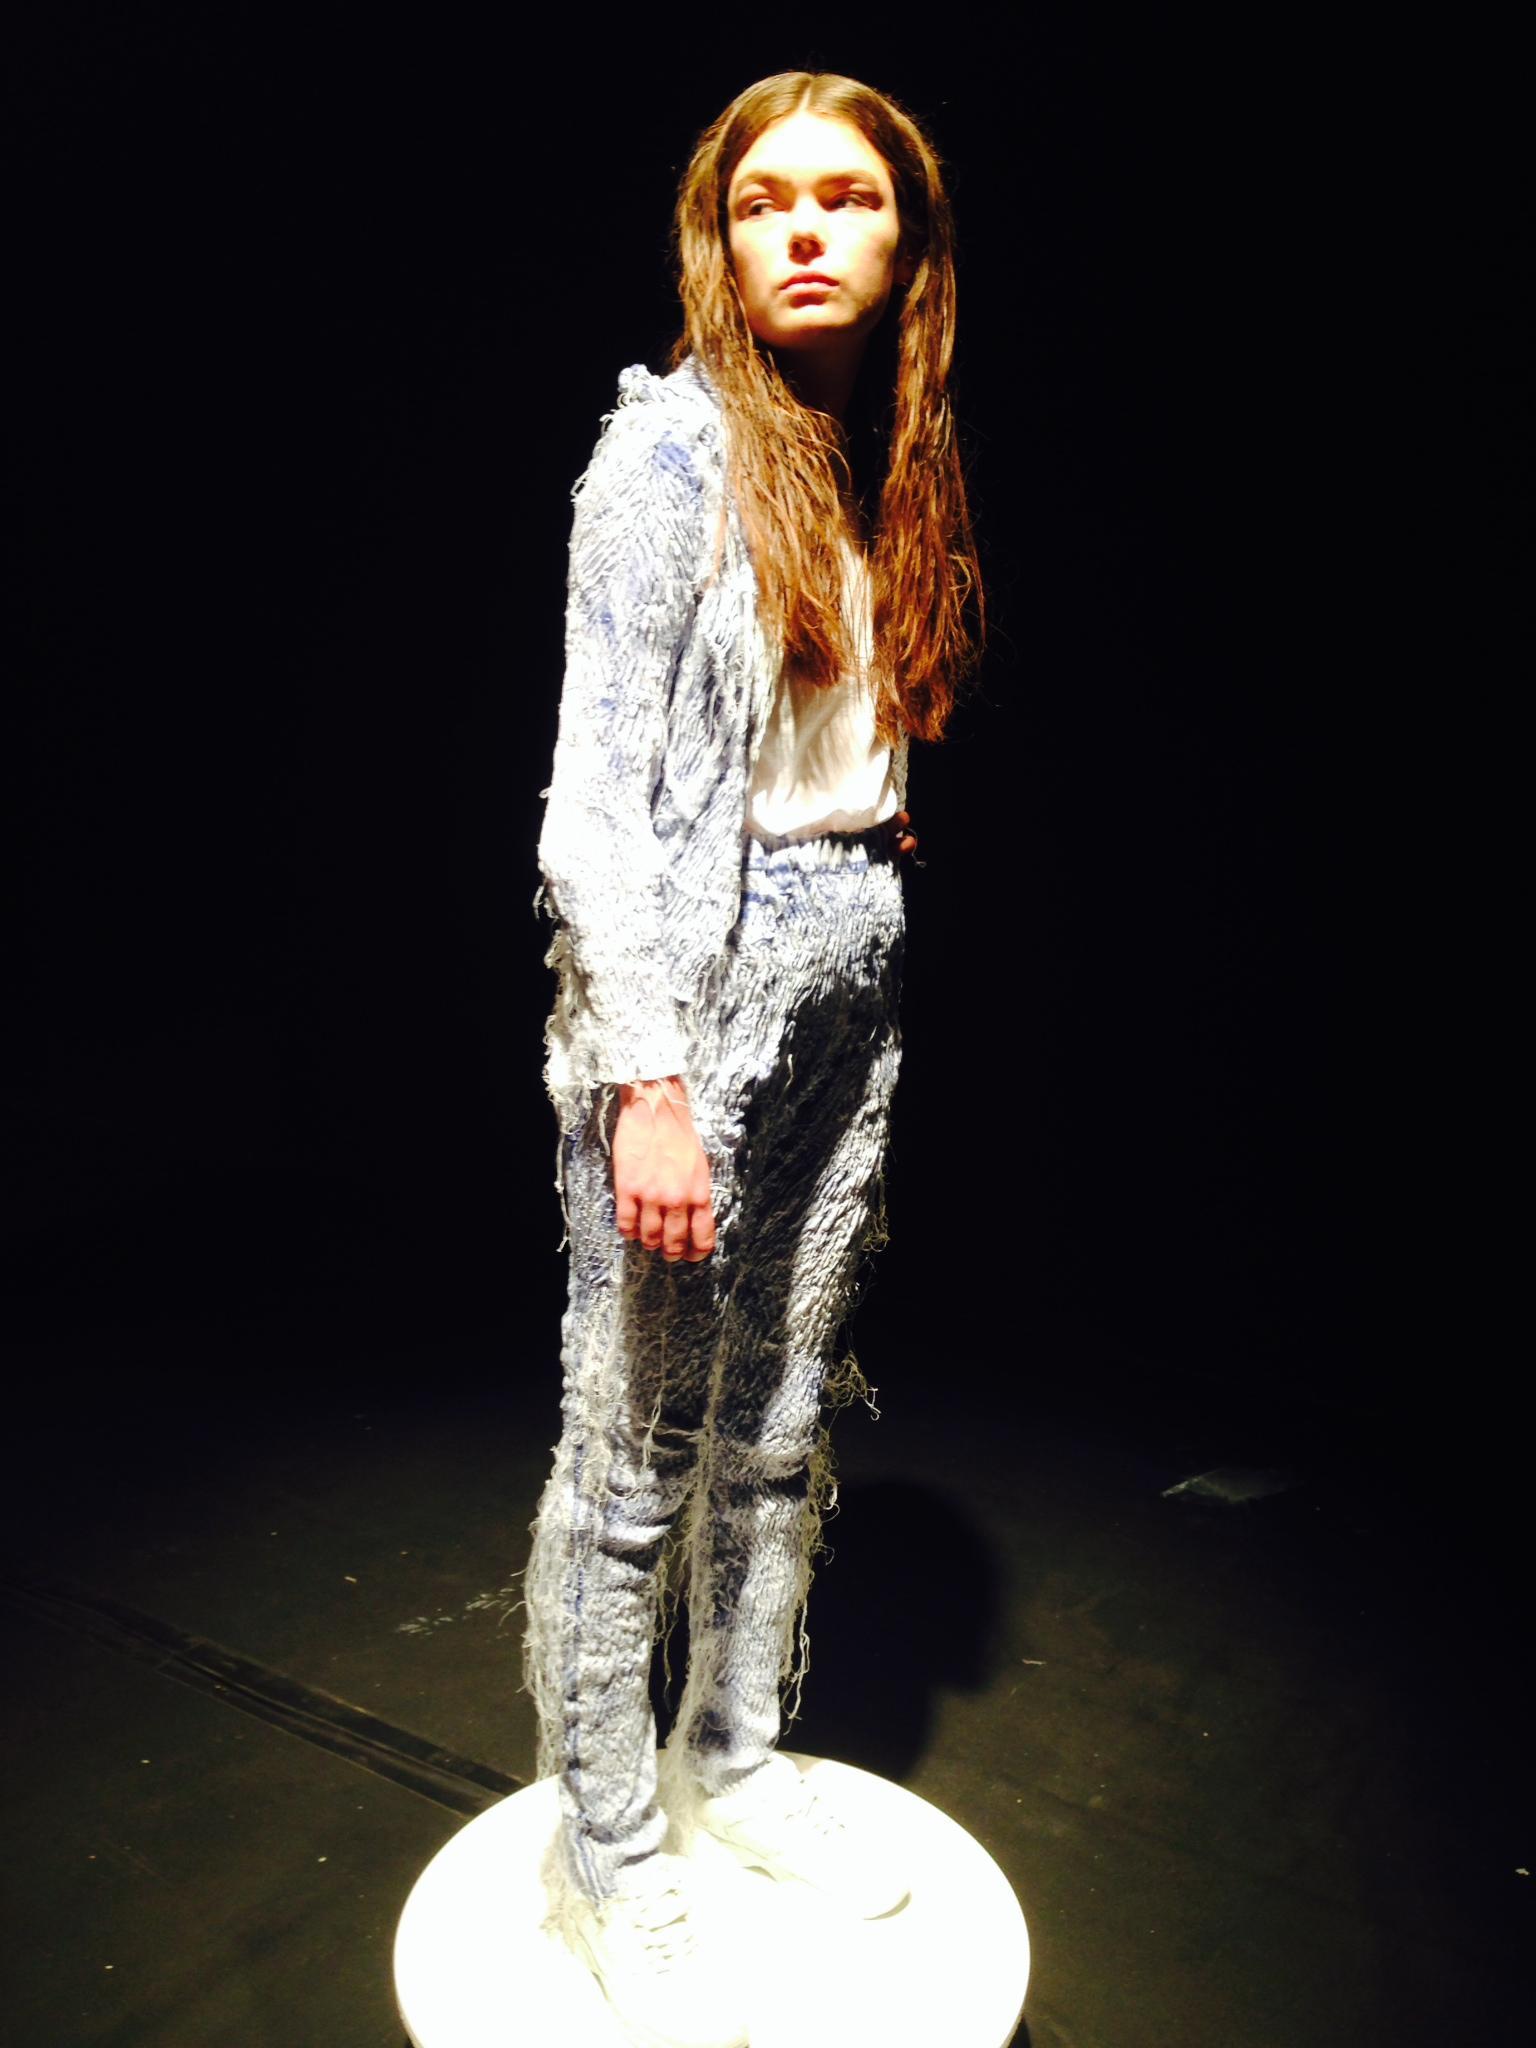 faustine-steinmetz-creatrice-parisienne-londres-fashion